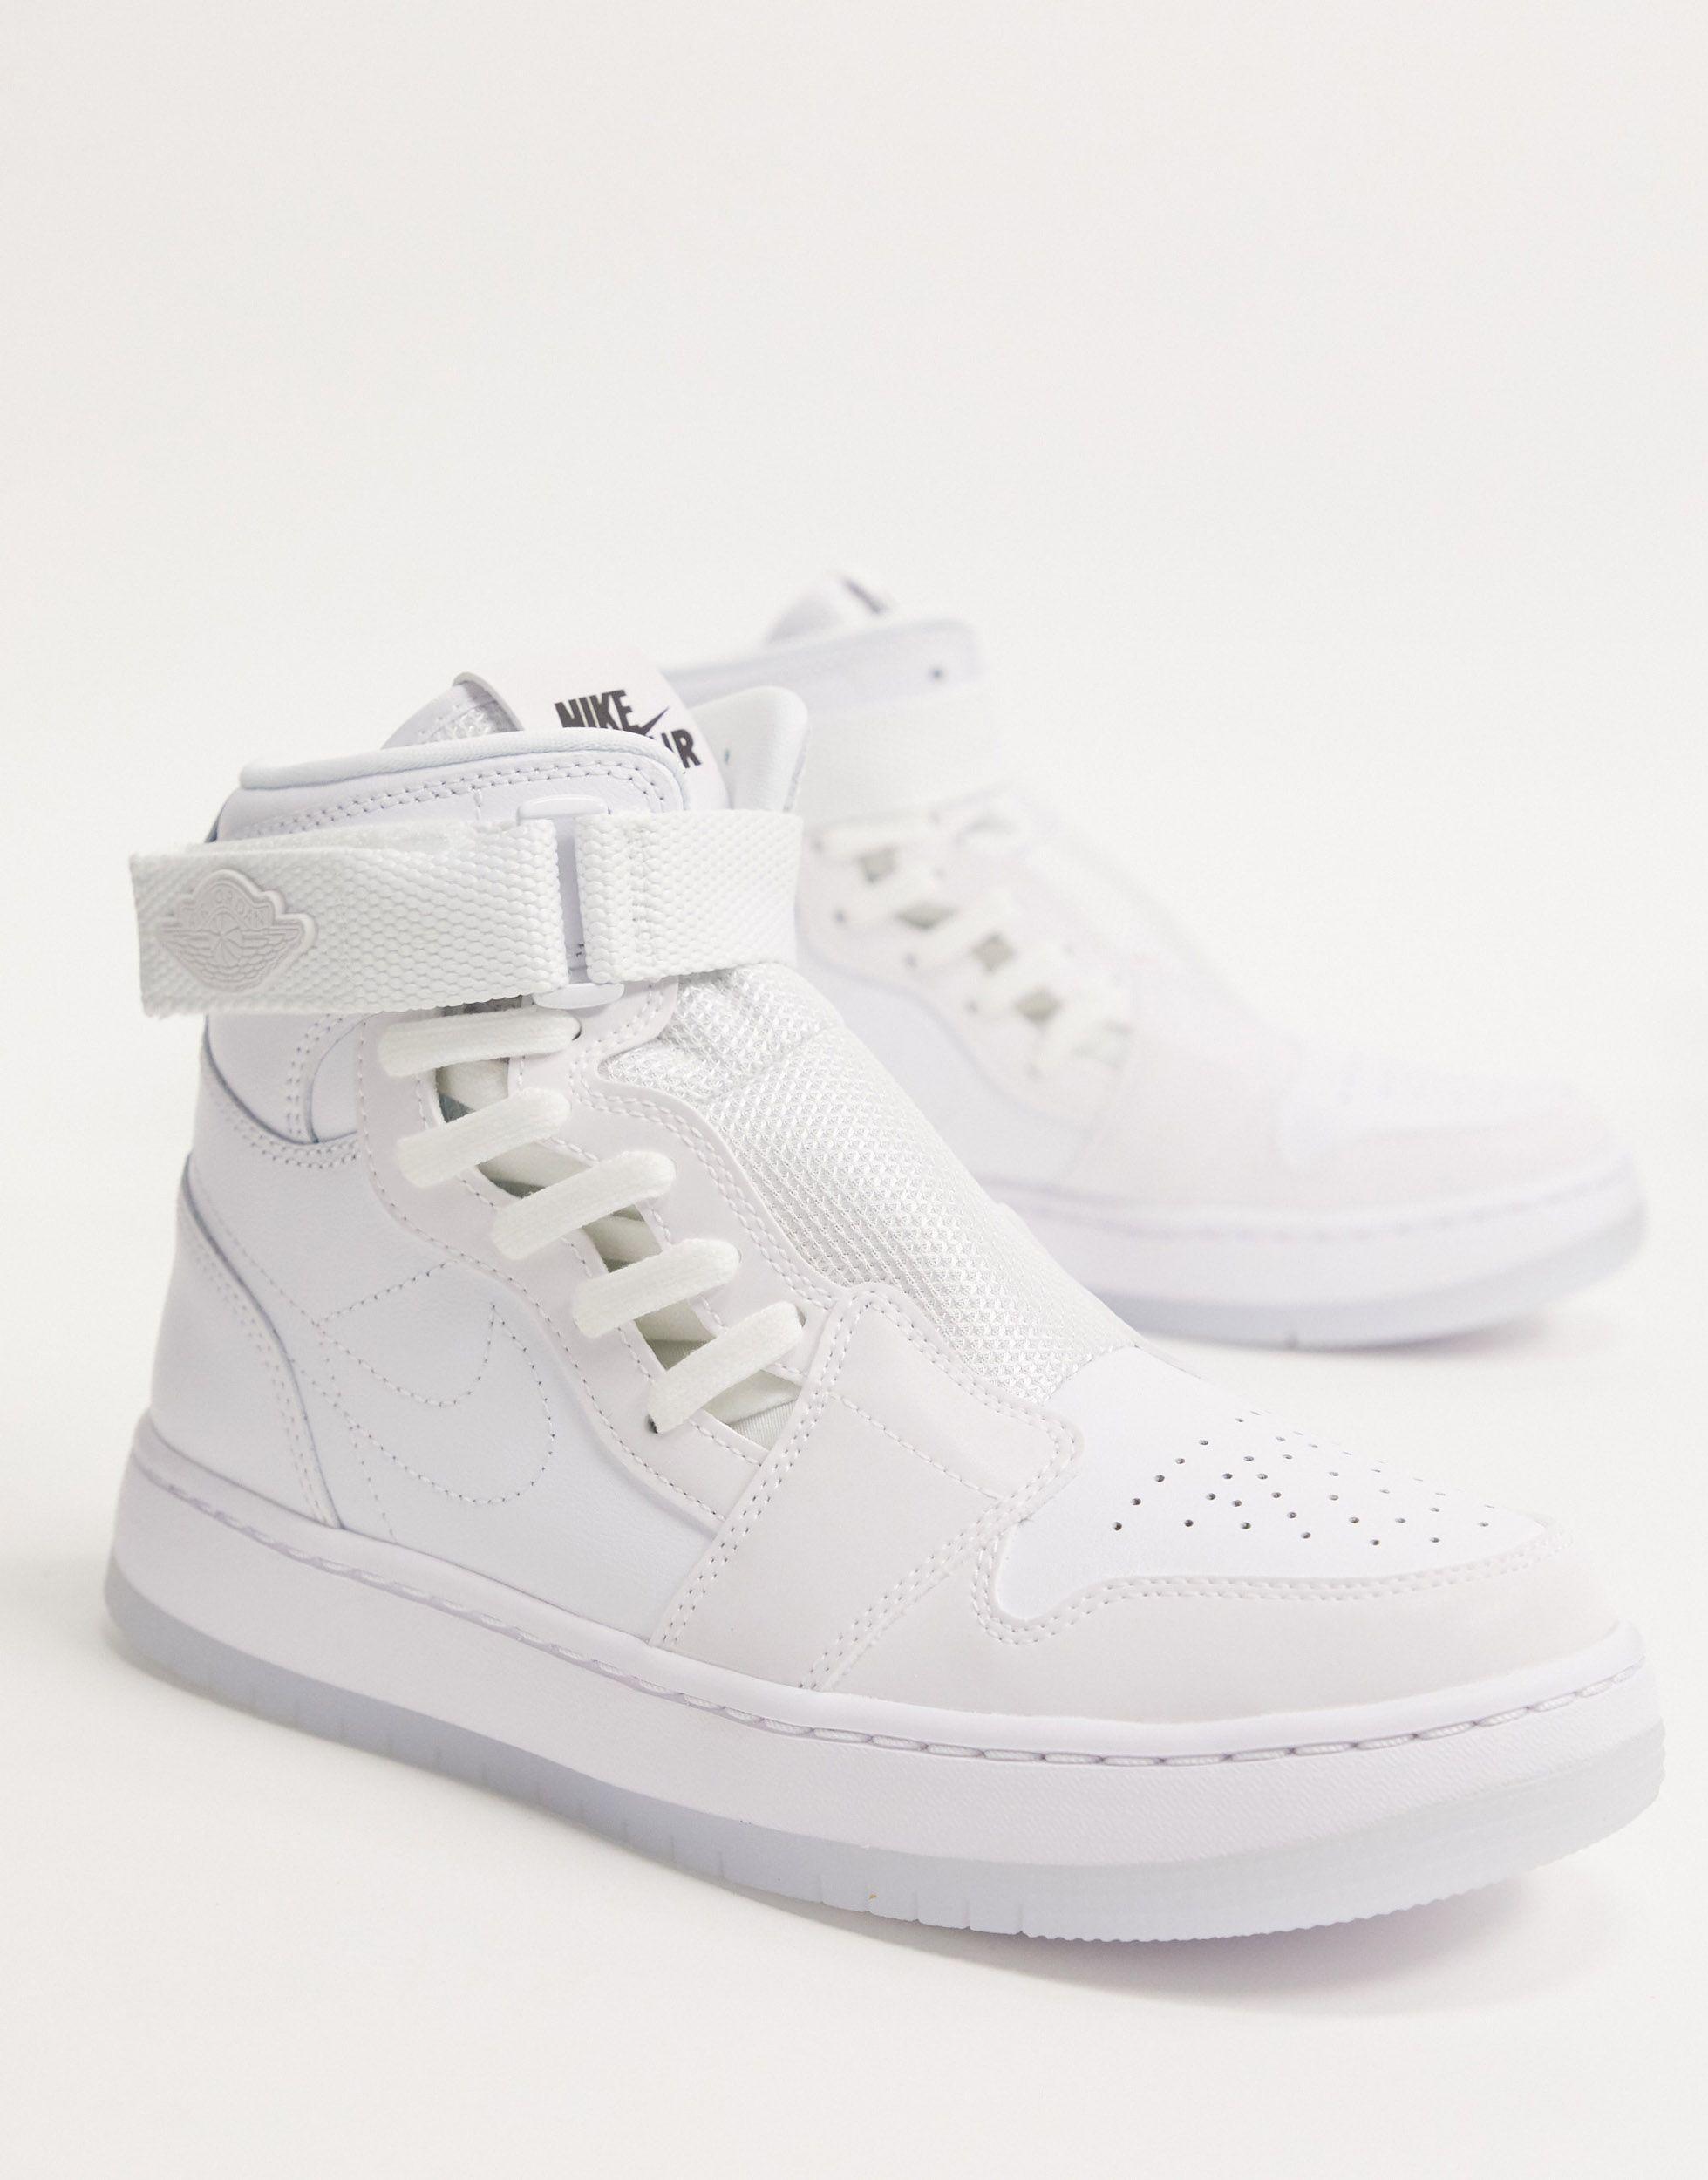 Nike Leather Air Jordan 1 Nova Xx Shoe in White/Black/White (White ...